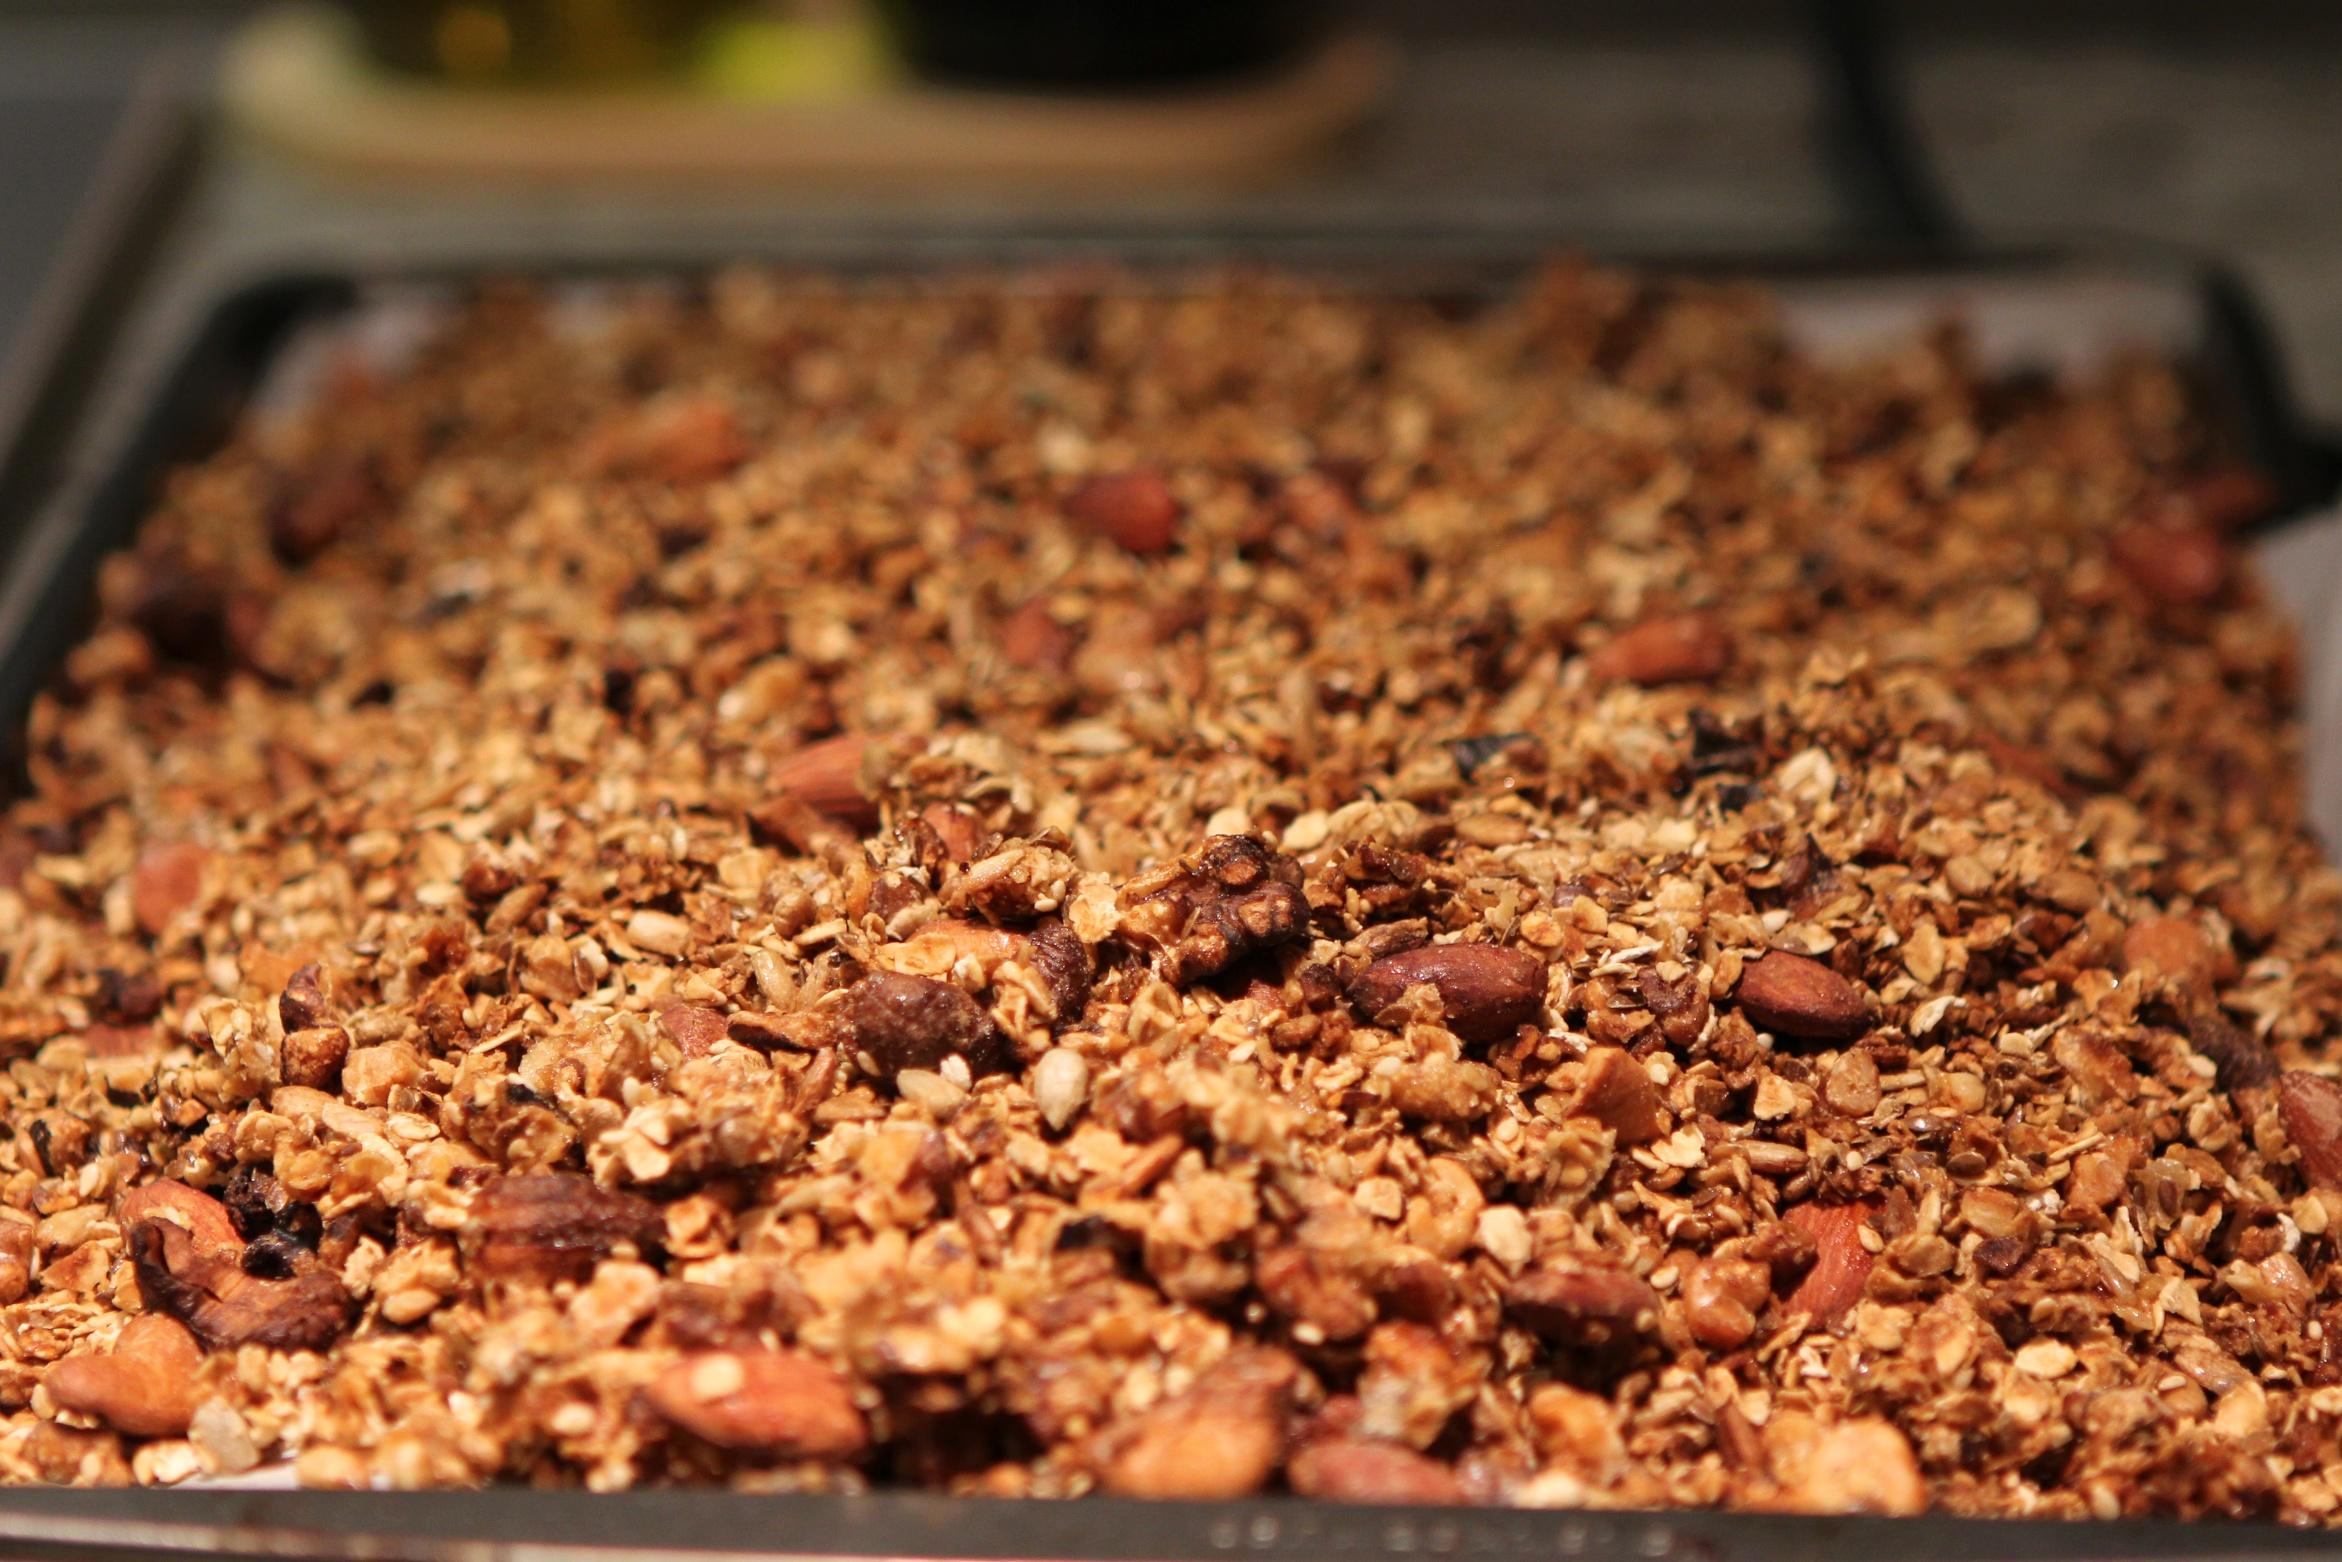 Homemade Granola (photo: Raphael Marinho)